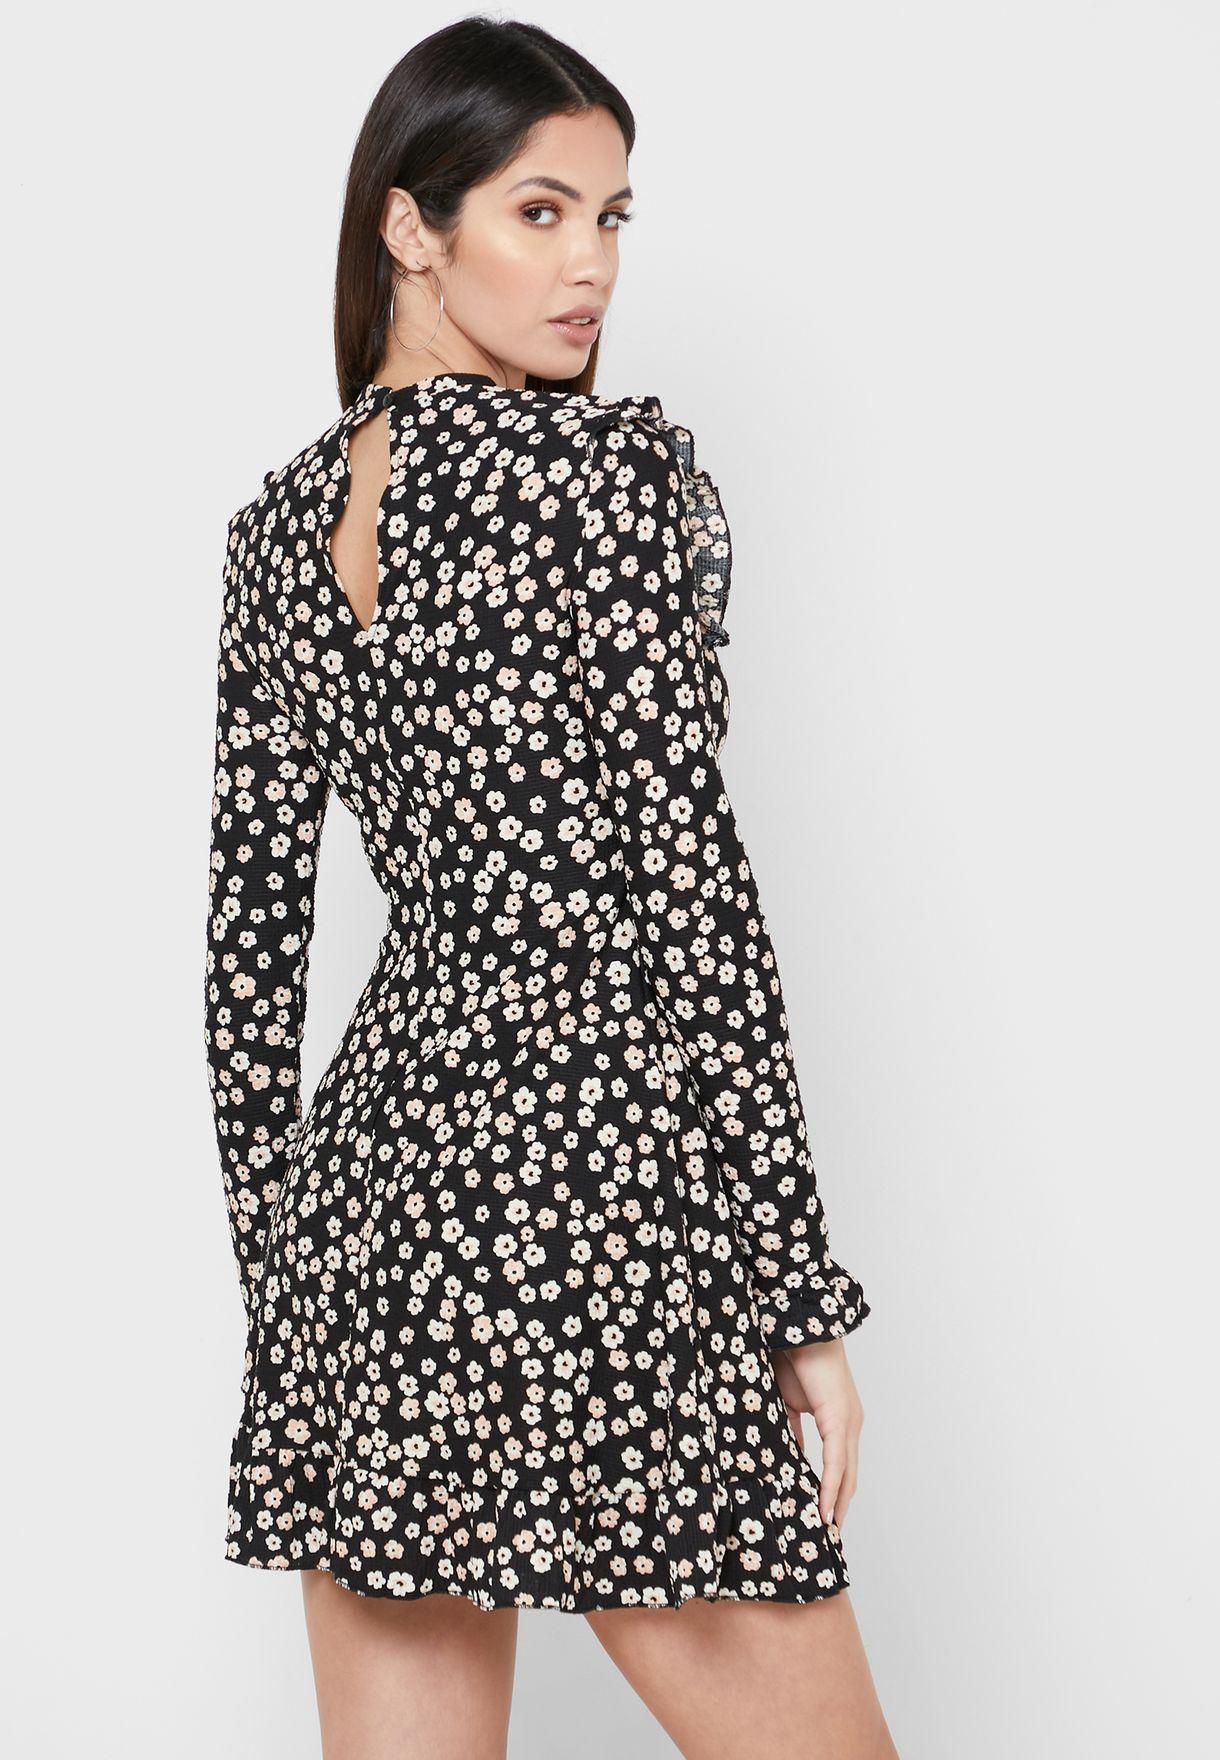 Ruffle Detail Floral Print Dress